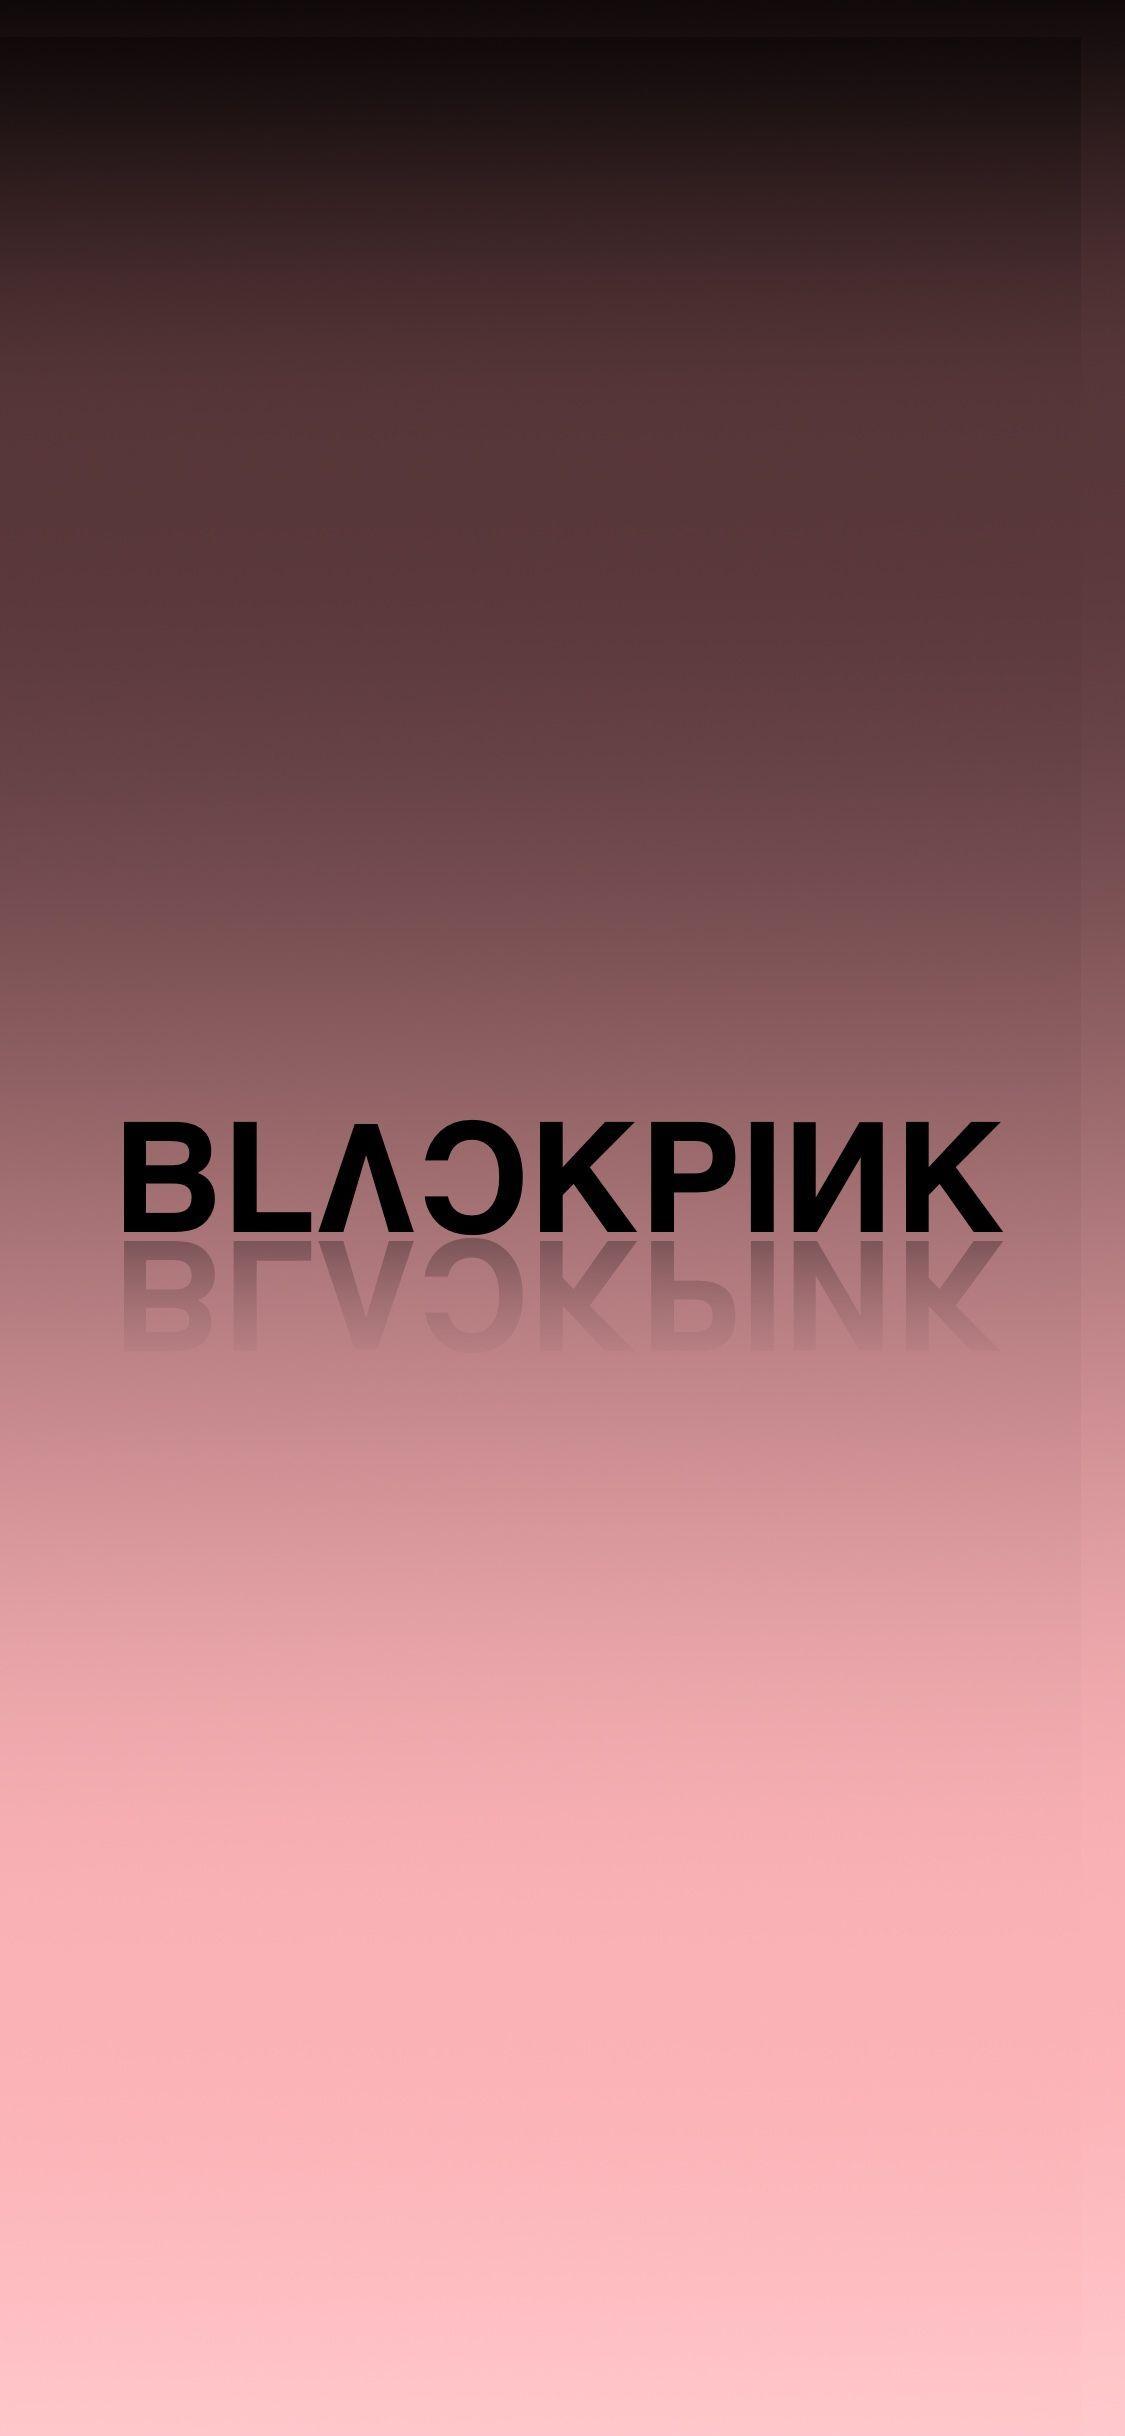 Blackpink Wallpaper For Iphone Xs Max Iphonexsmax In 2020